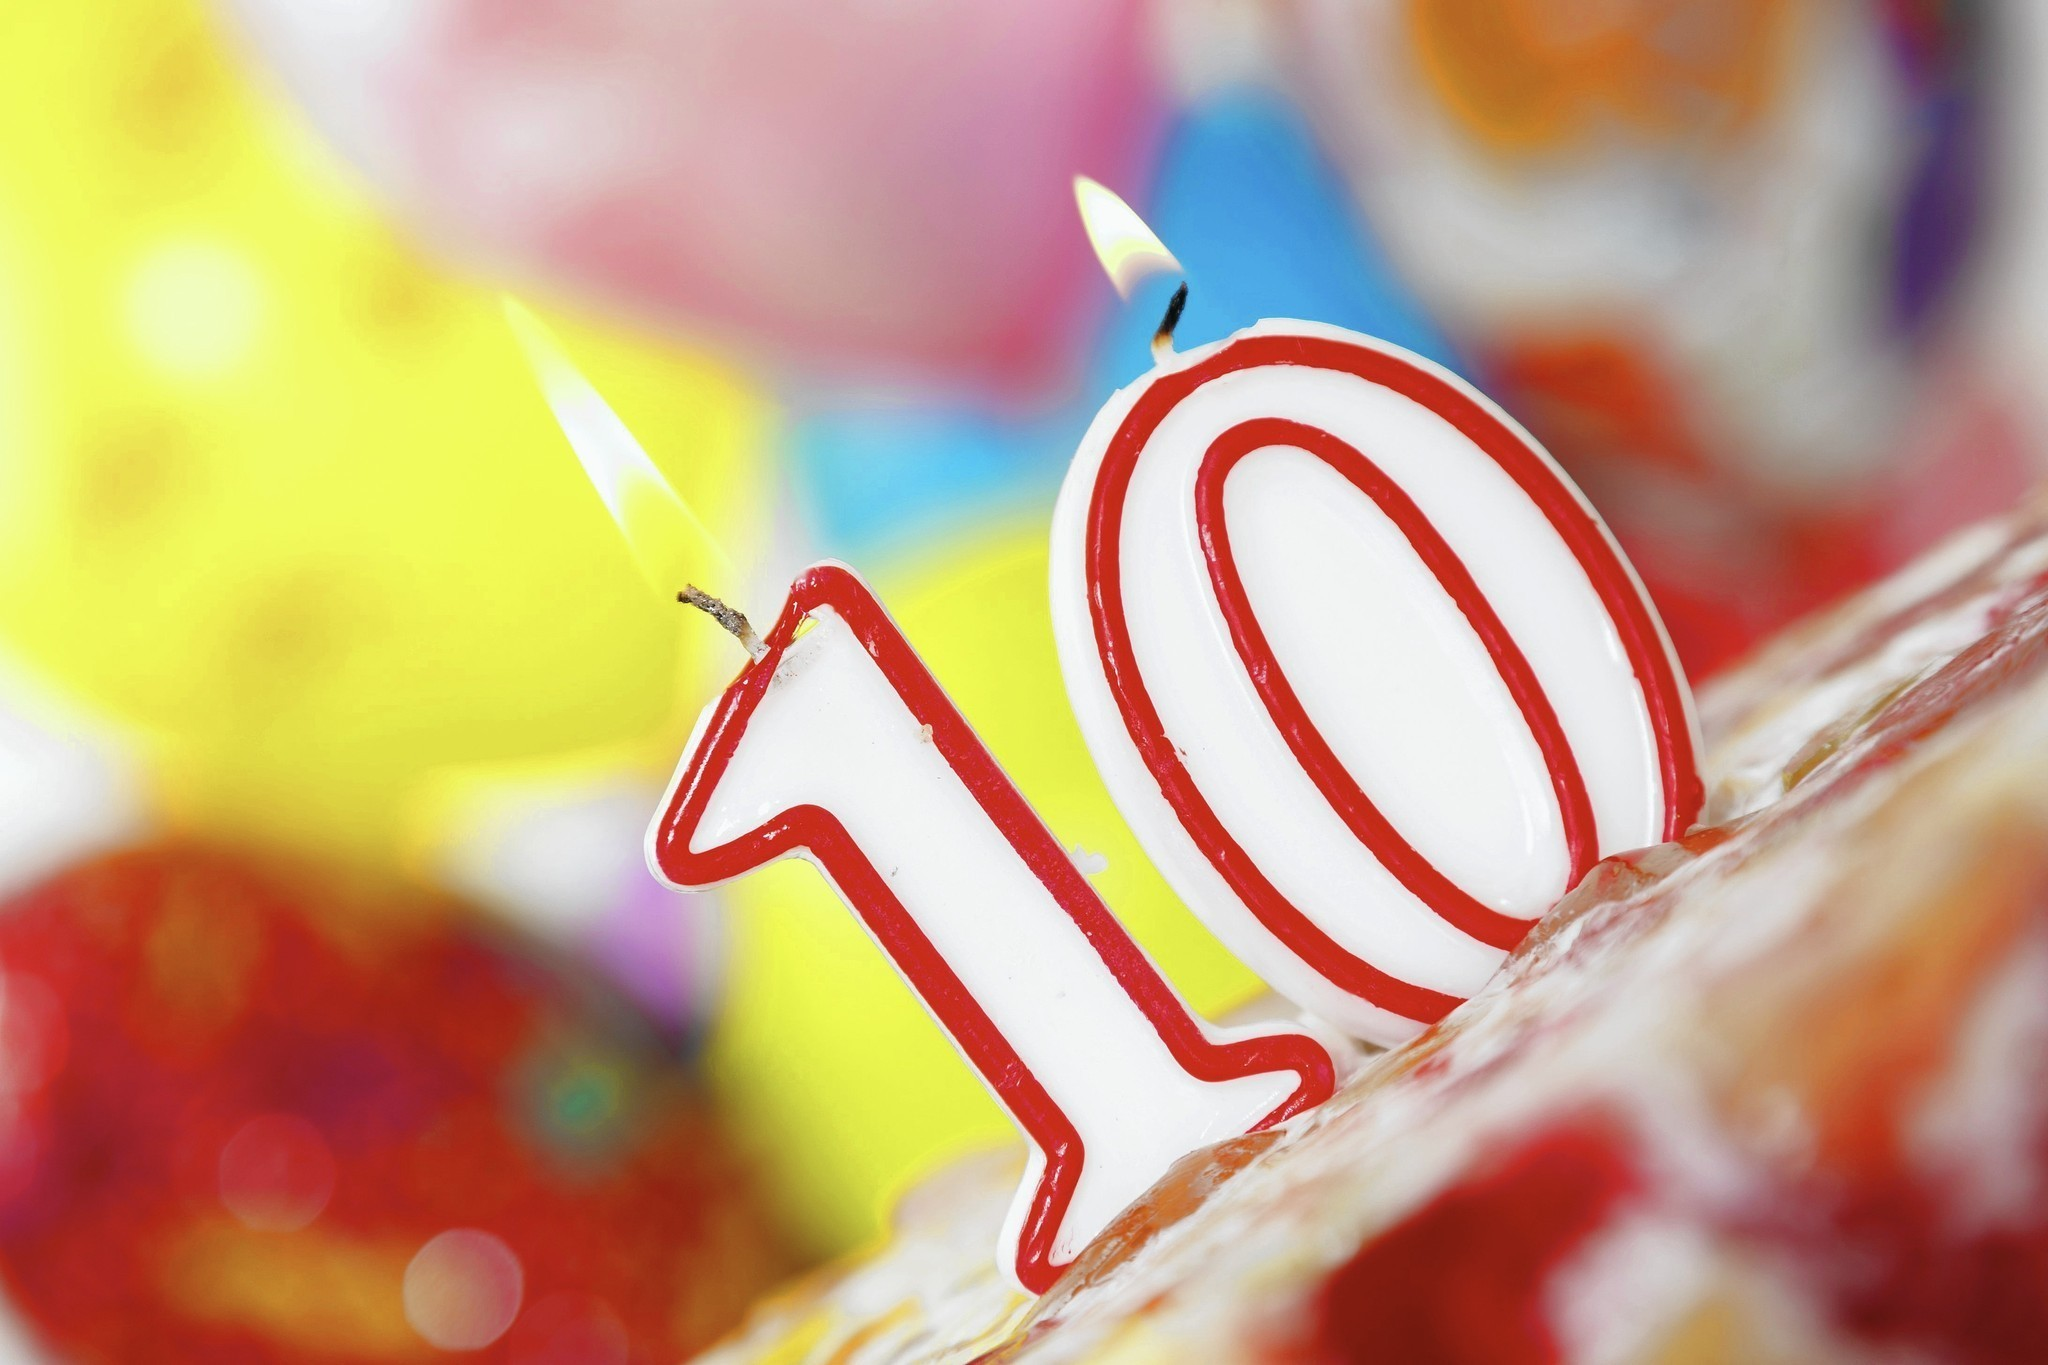 When A Milestone Birthday Feels Like Burden To Child Turning 10